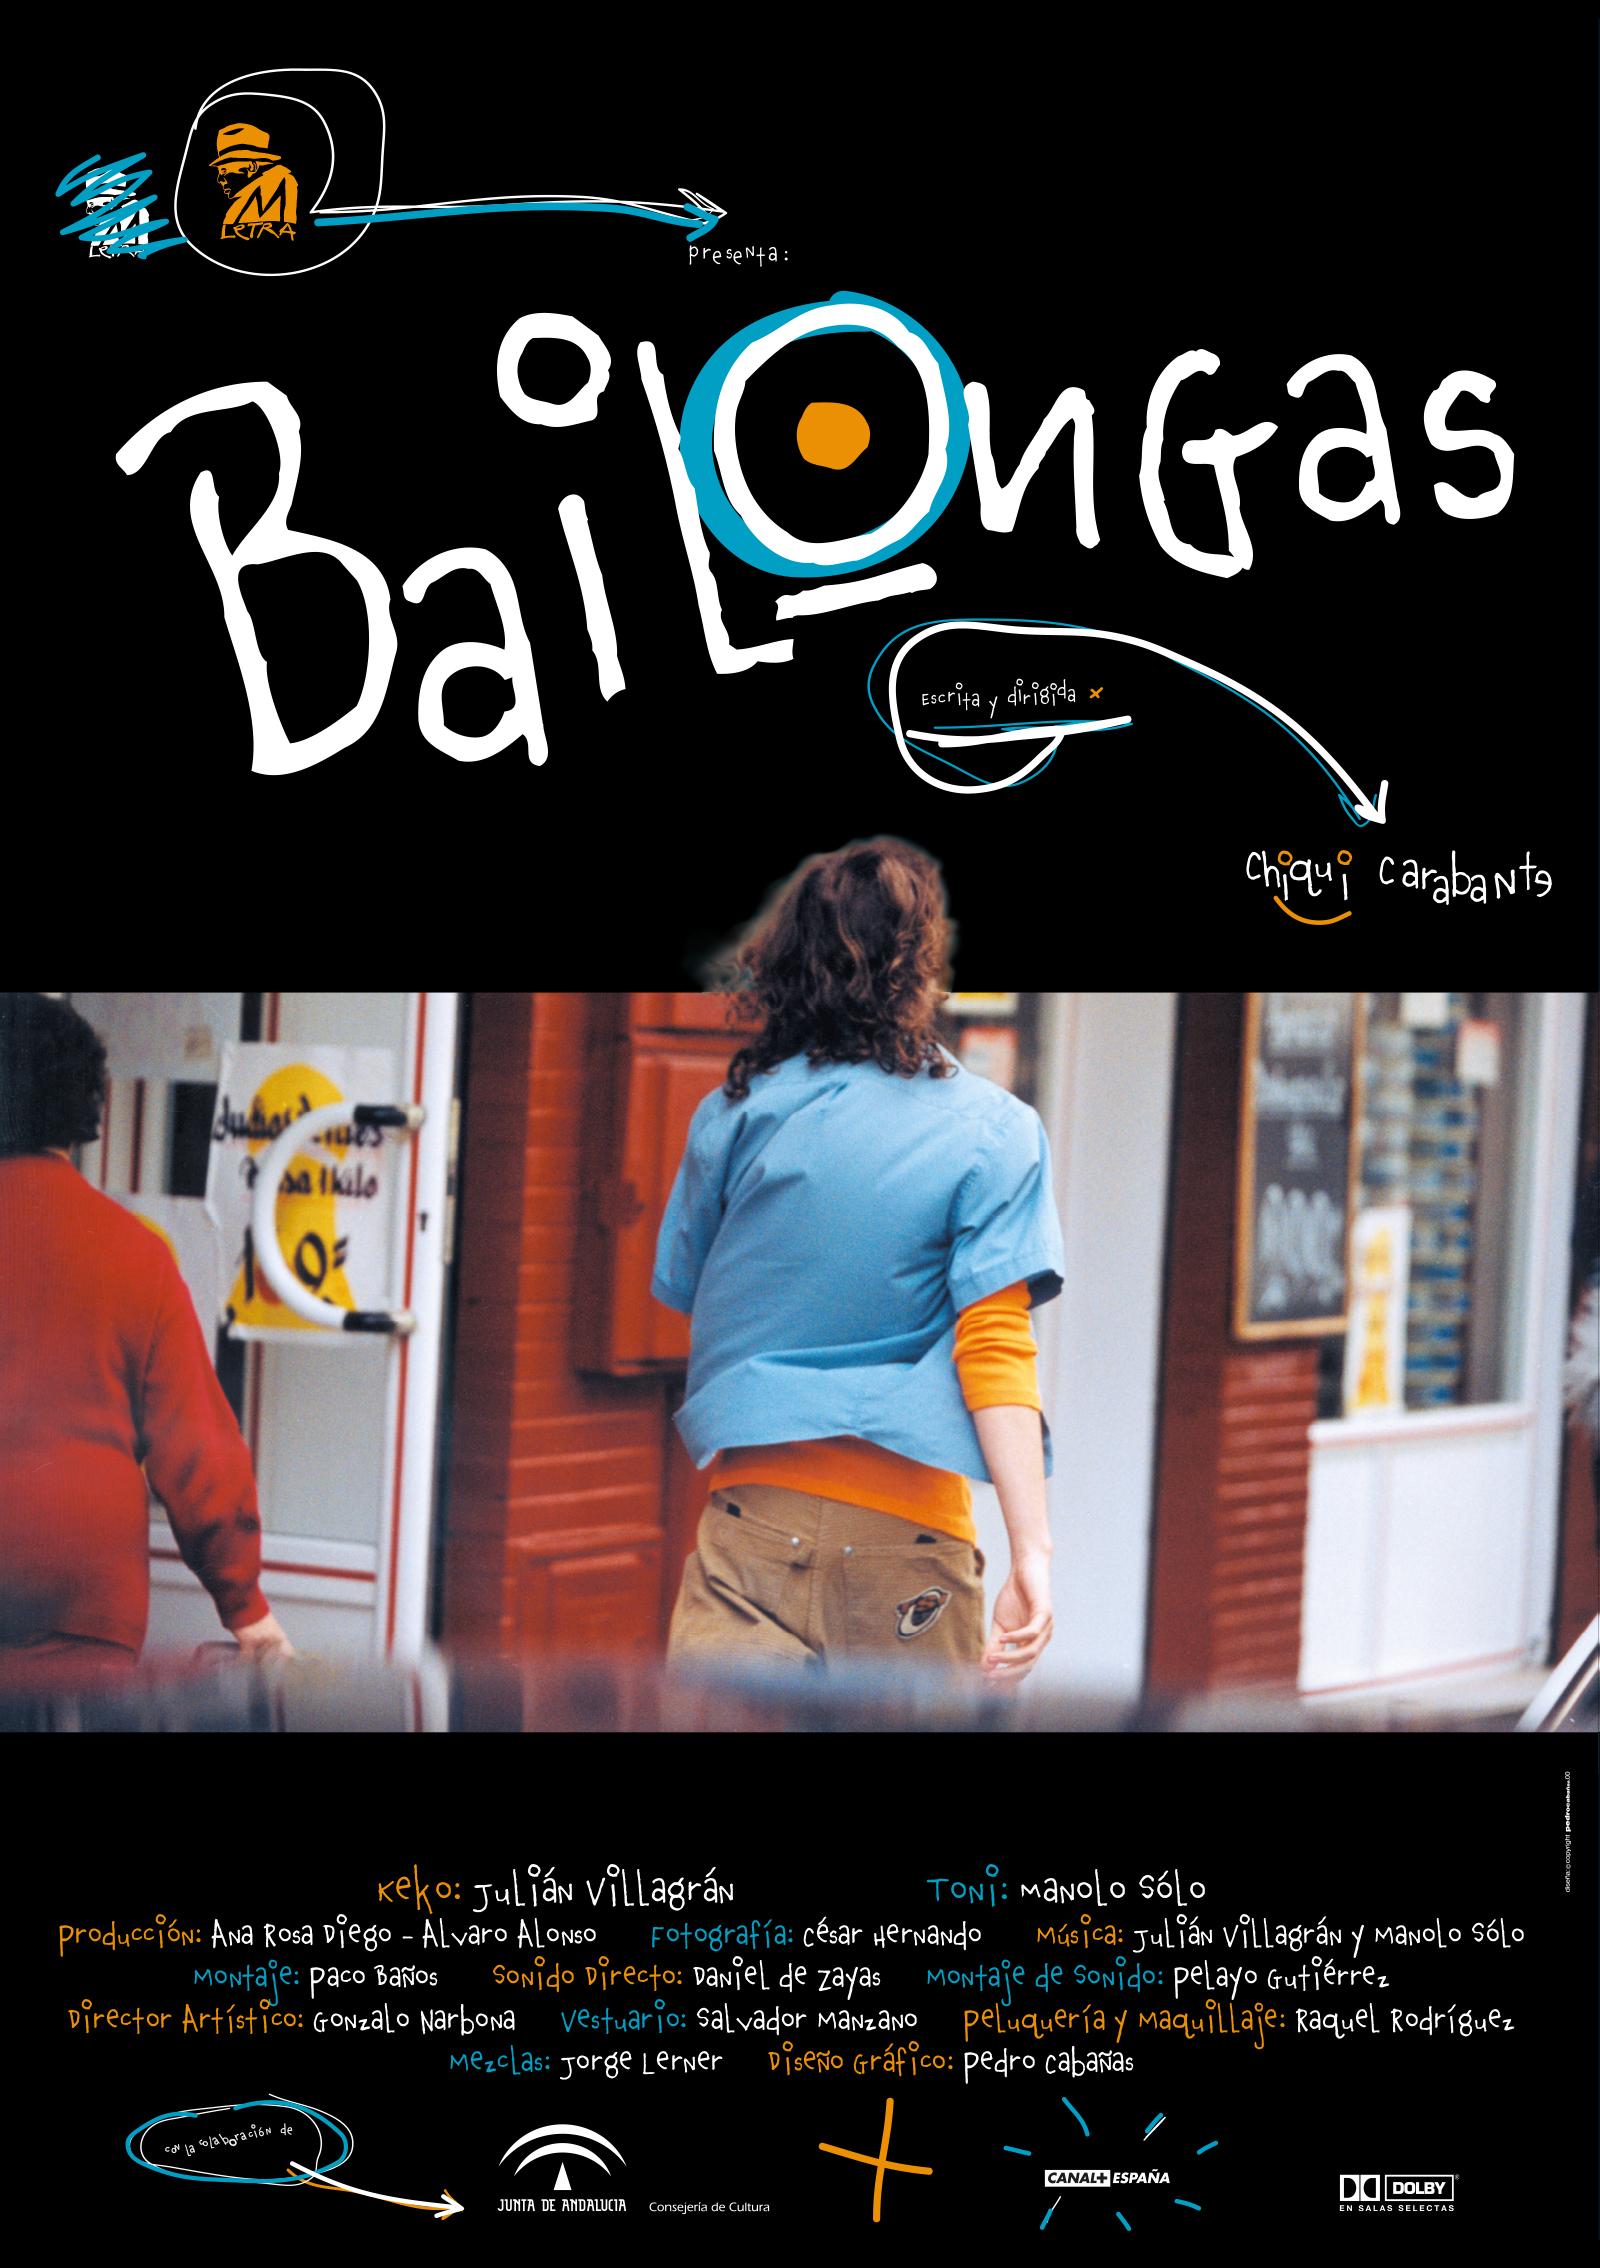 Pedro Cabañas - Design - BAILONGAS